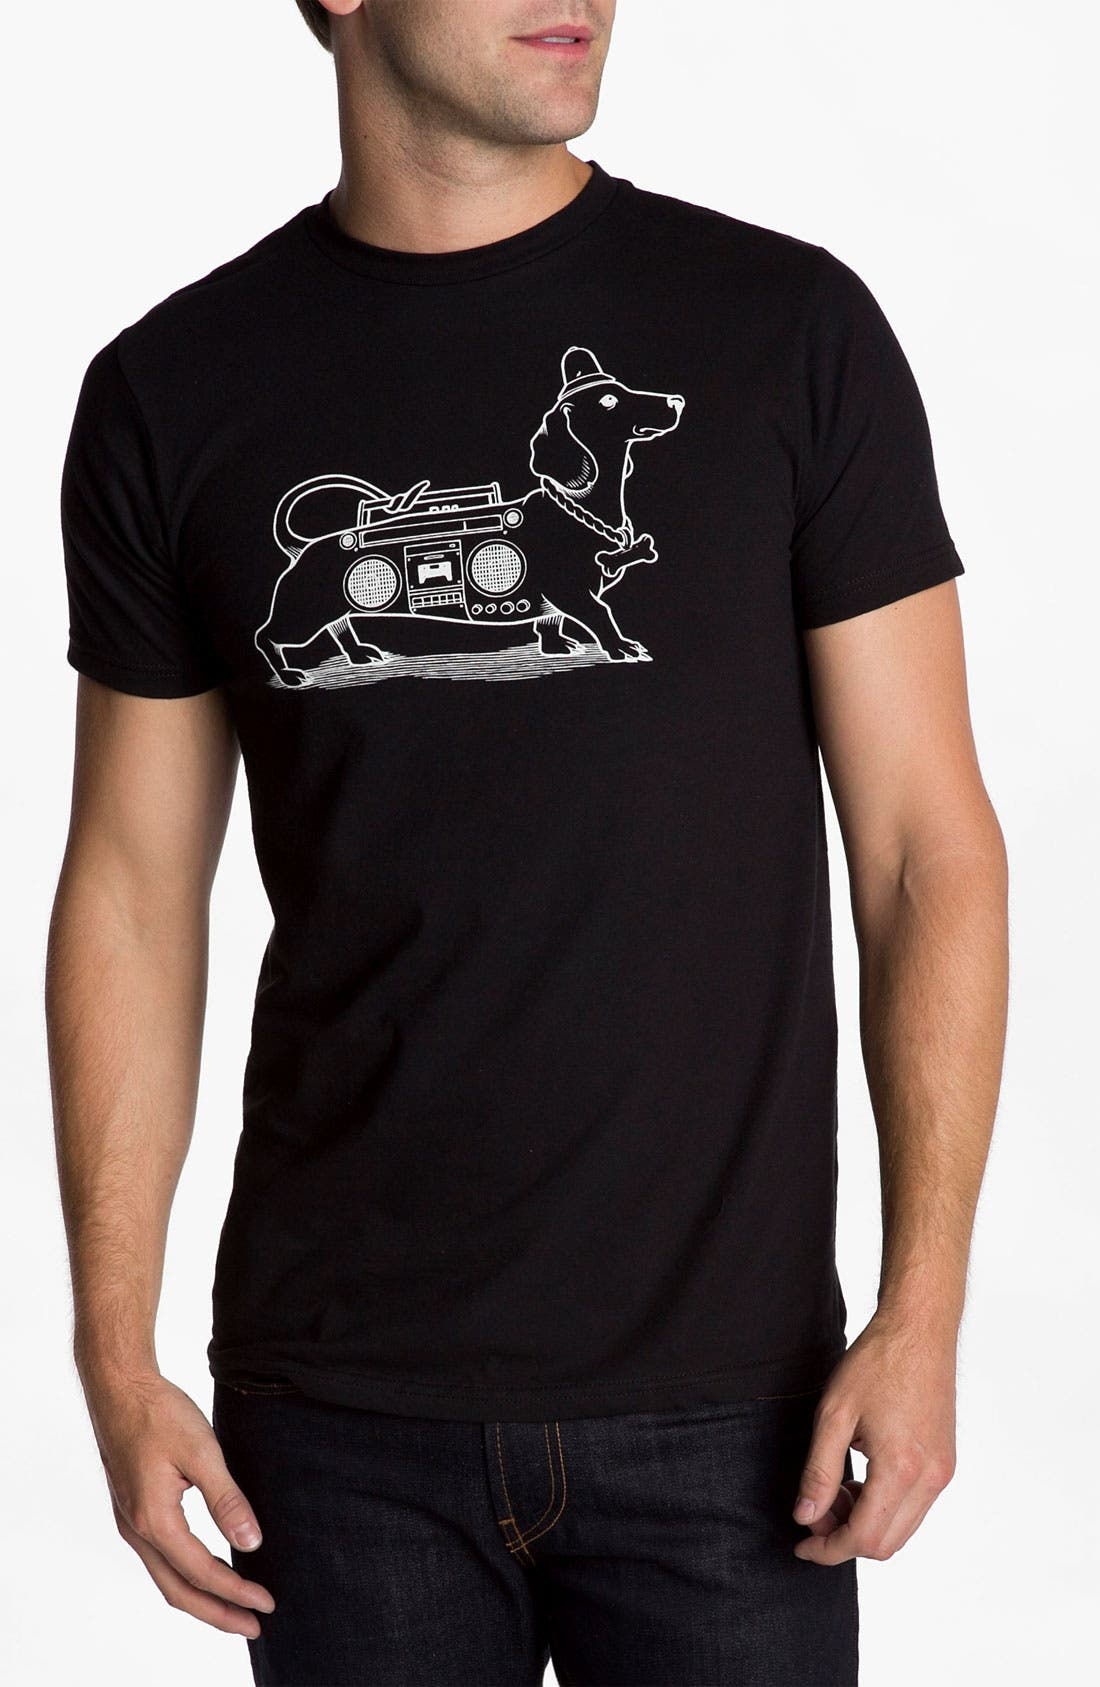 Alternate Image 1 Selected - Upper Playground 'Hot Dog' T-Shirt